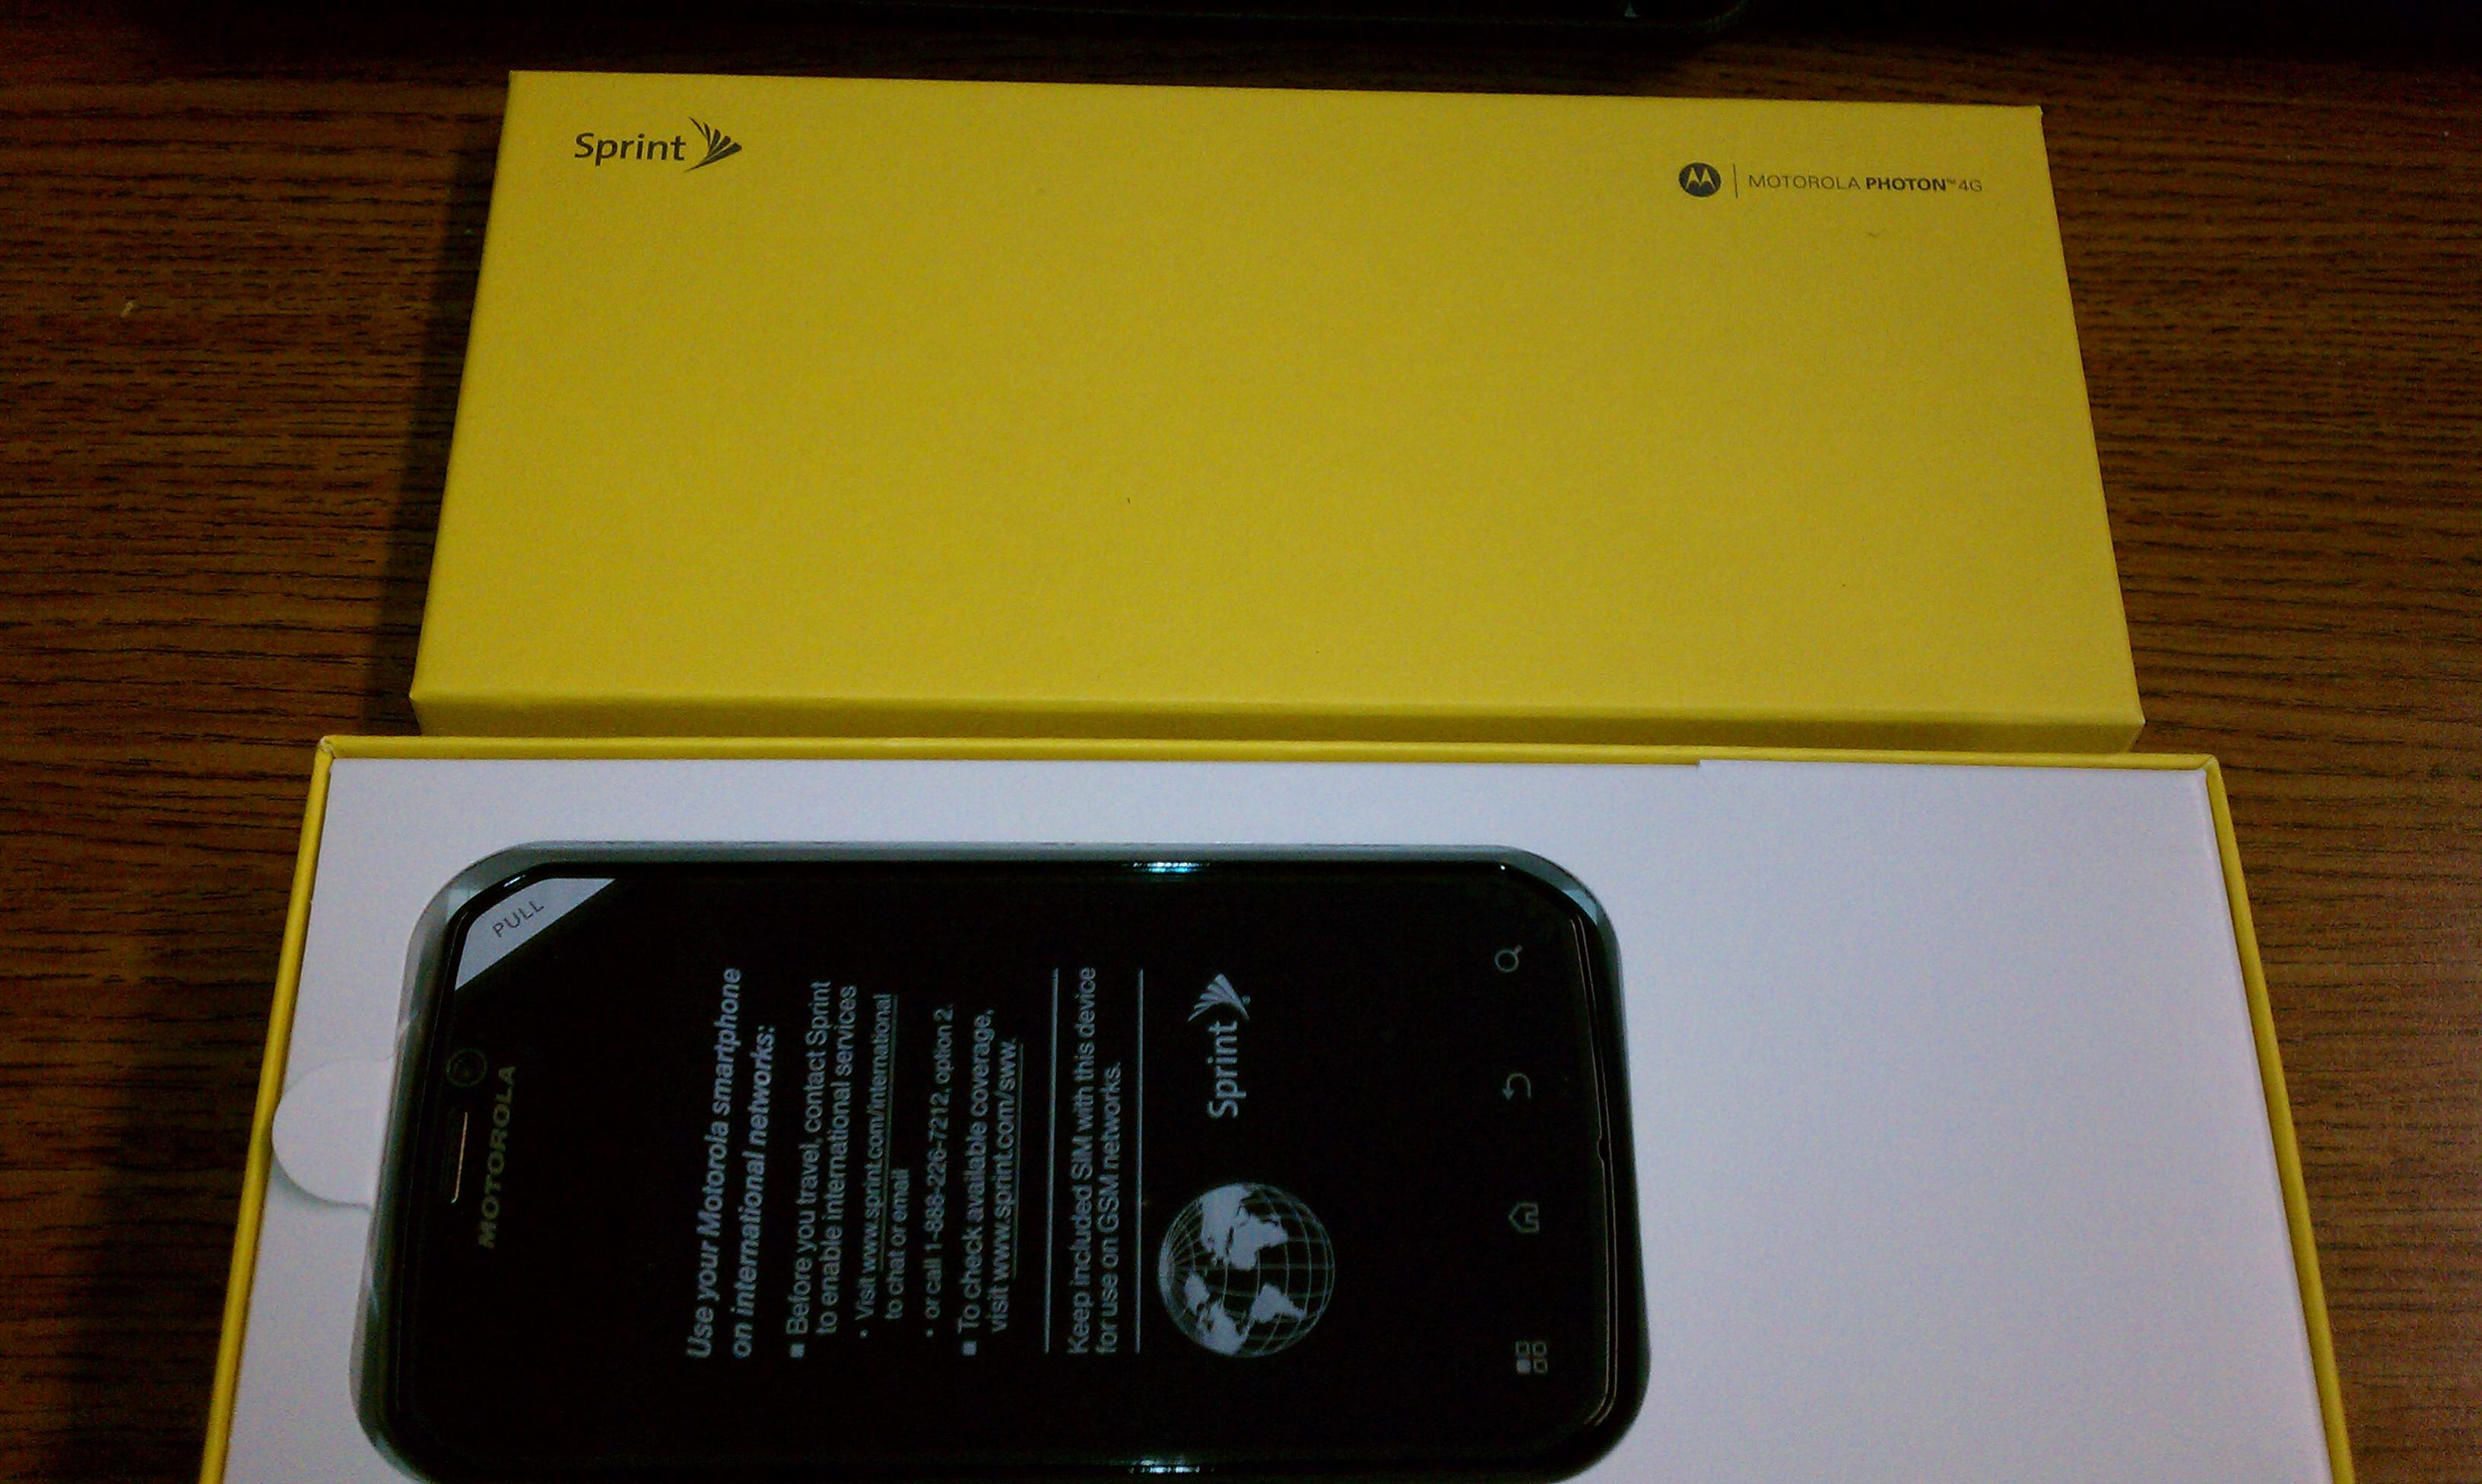 Cached Motorola photon 4g price